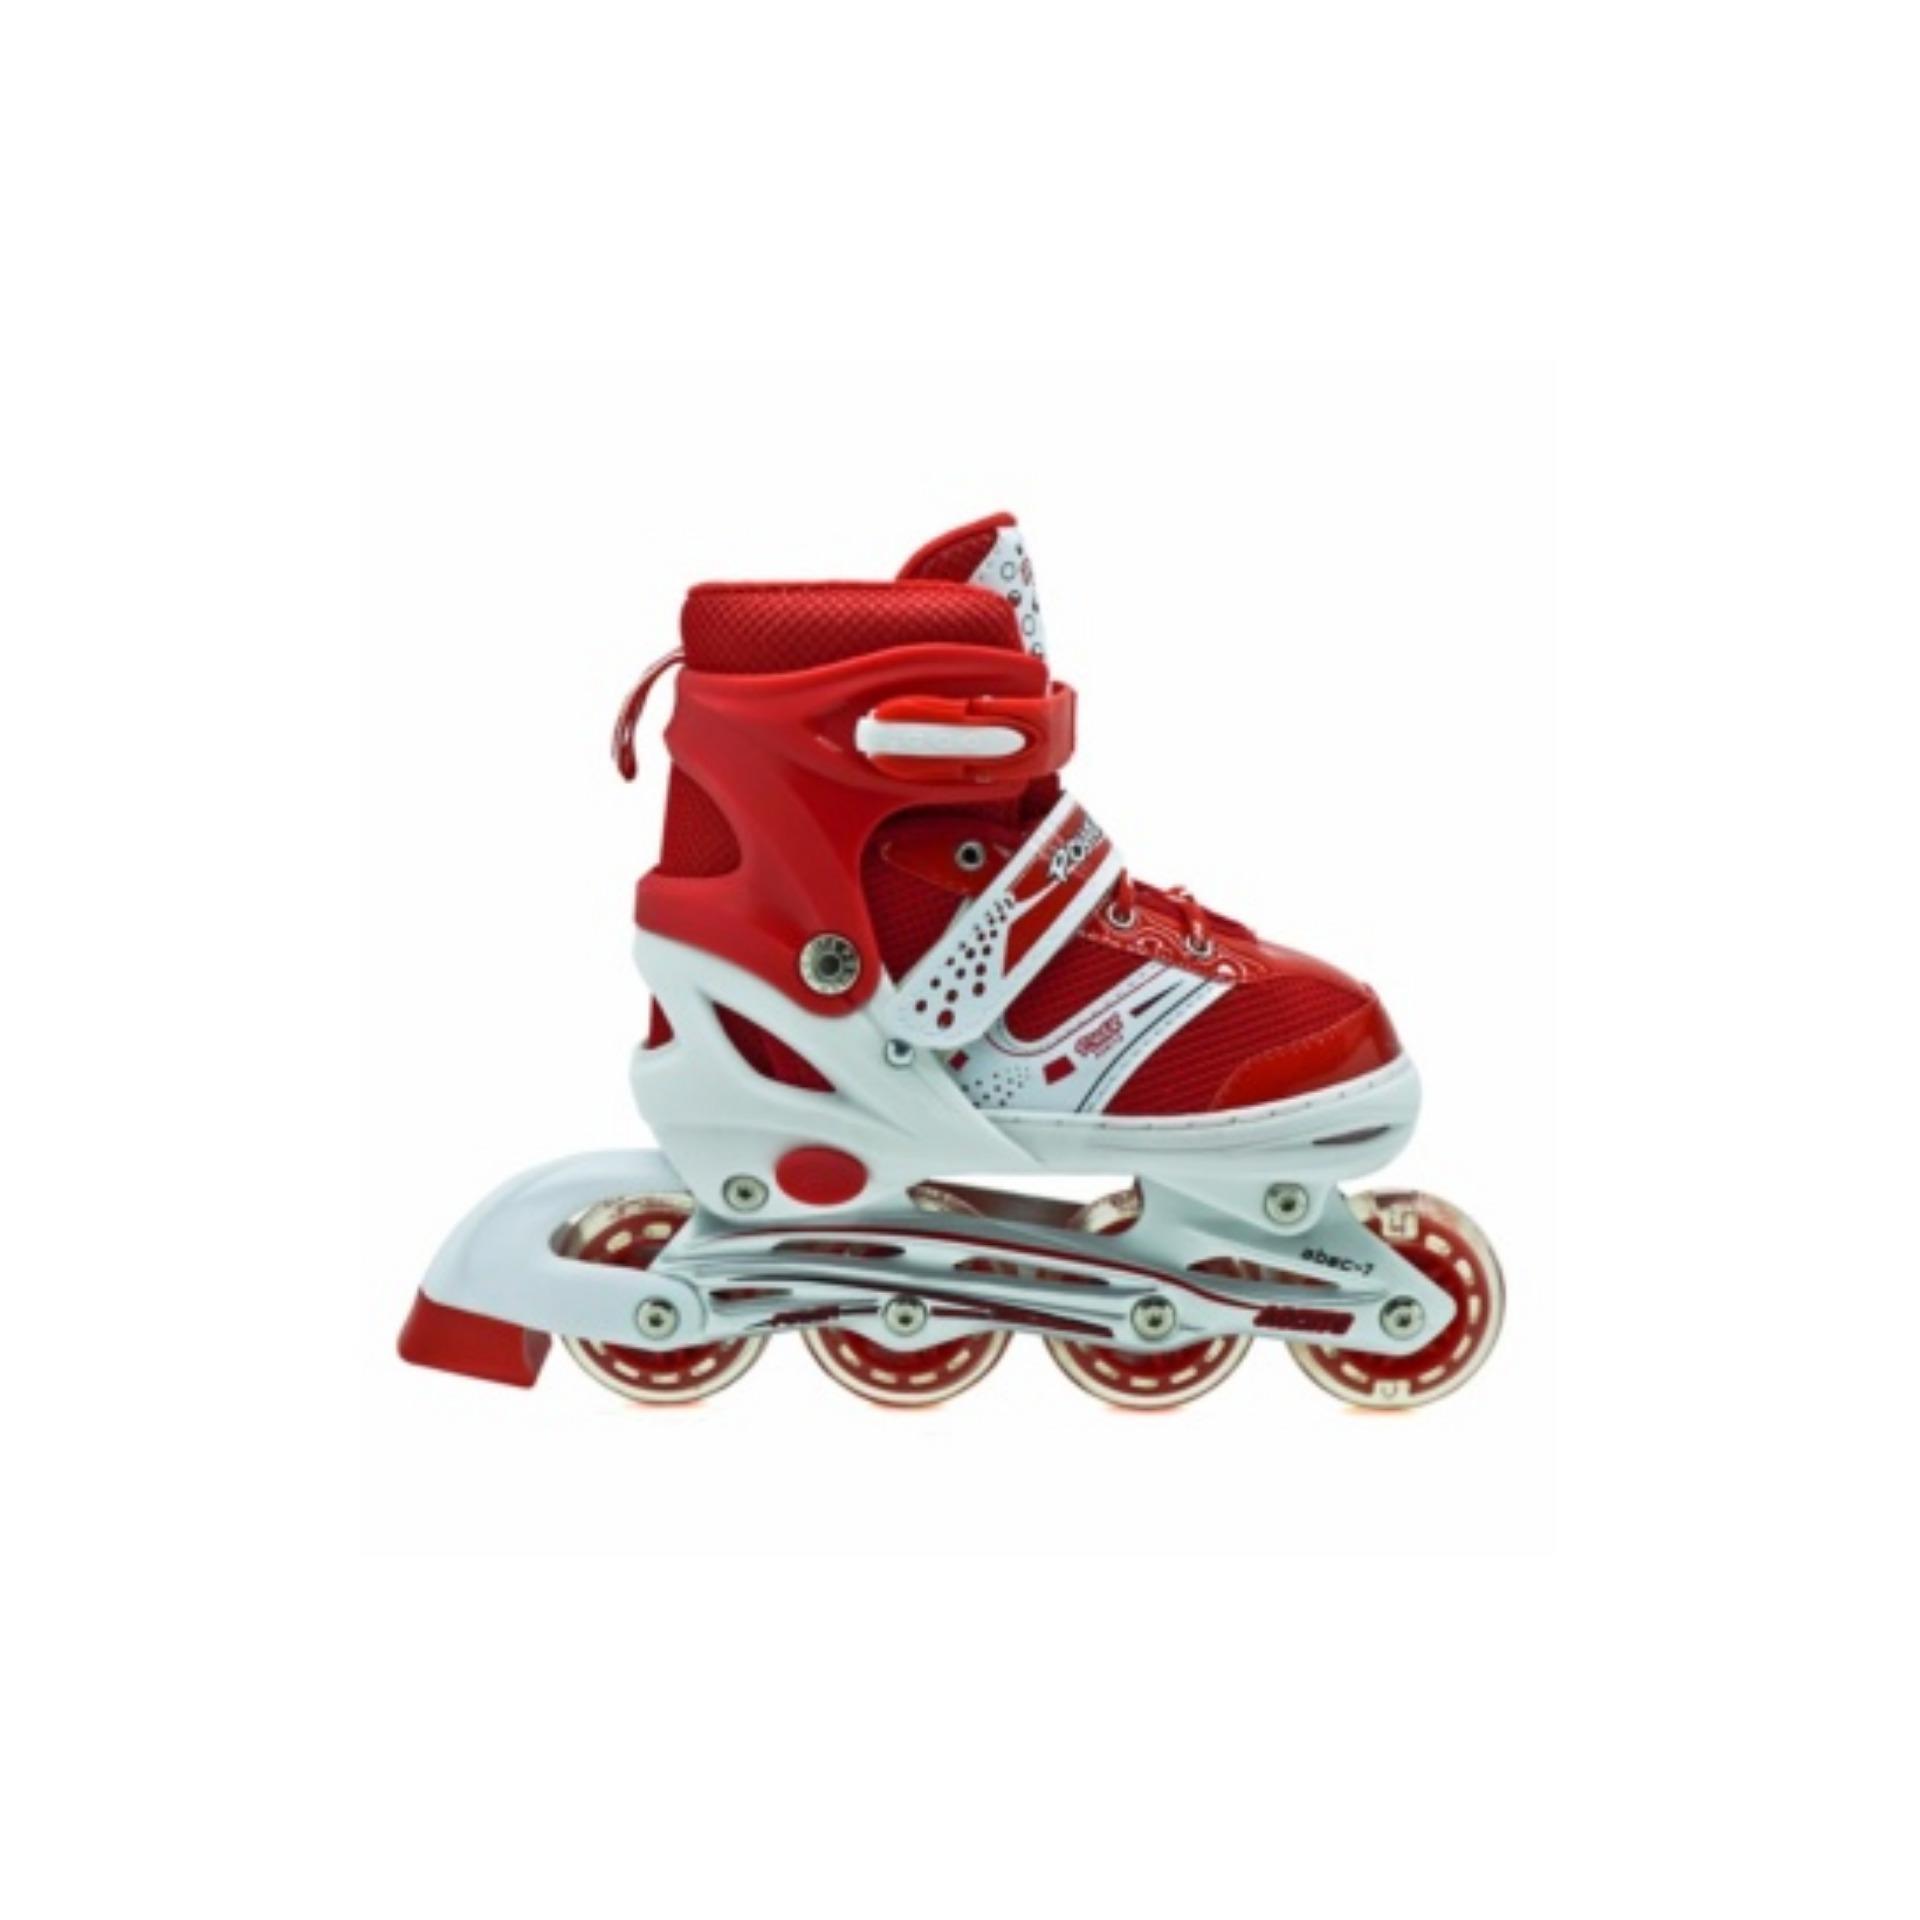 Harga Penawaran Power Sepatu Roda Inline Anak - Merah   Sepaturoda Inline  Skate Anak - Merah 31b0d23fea